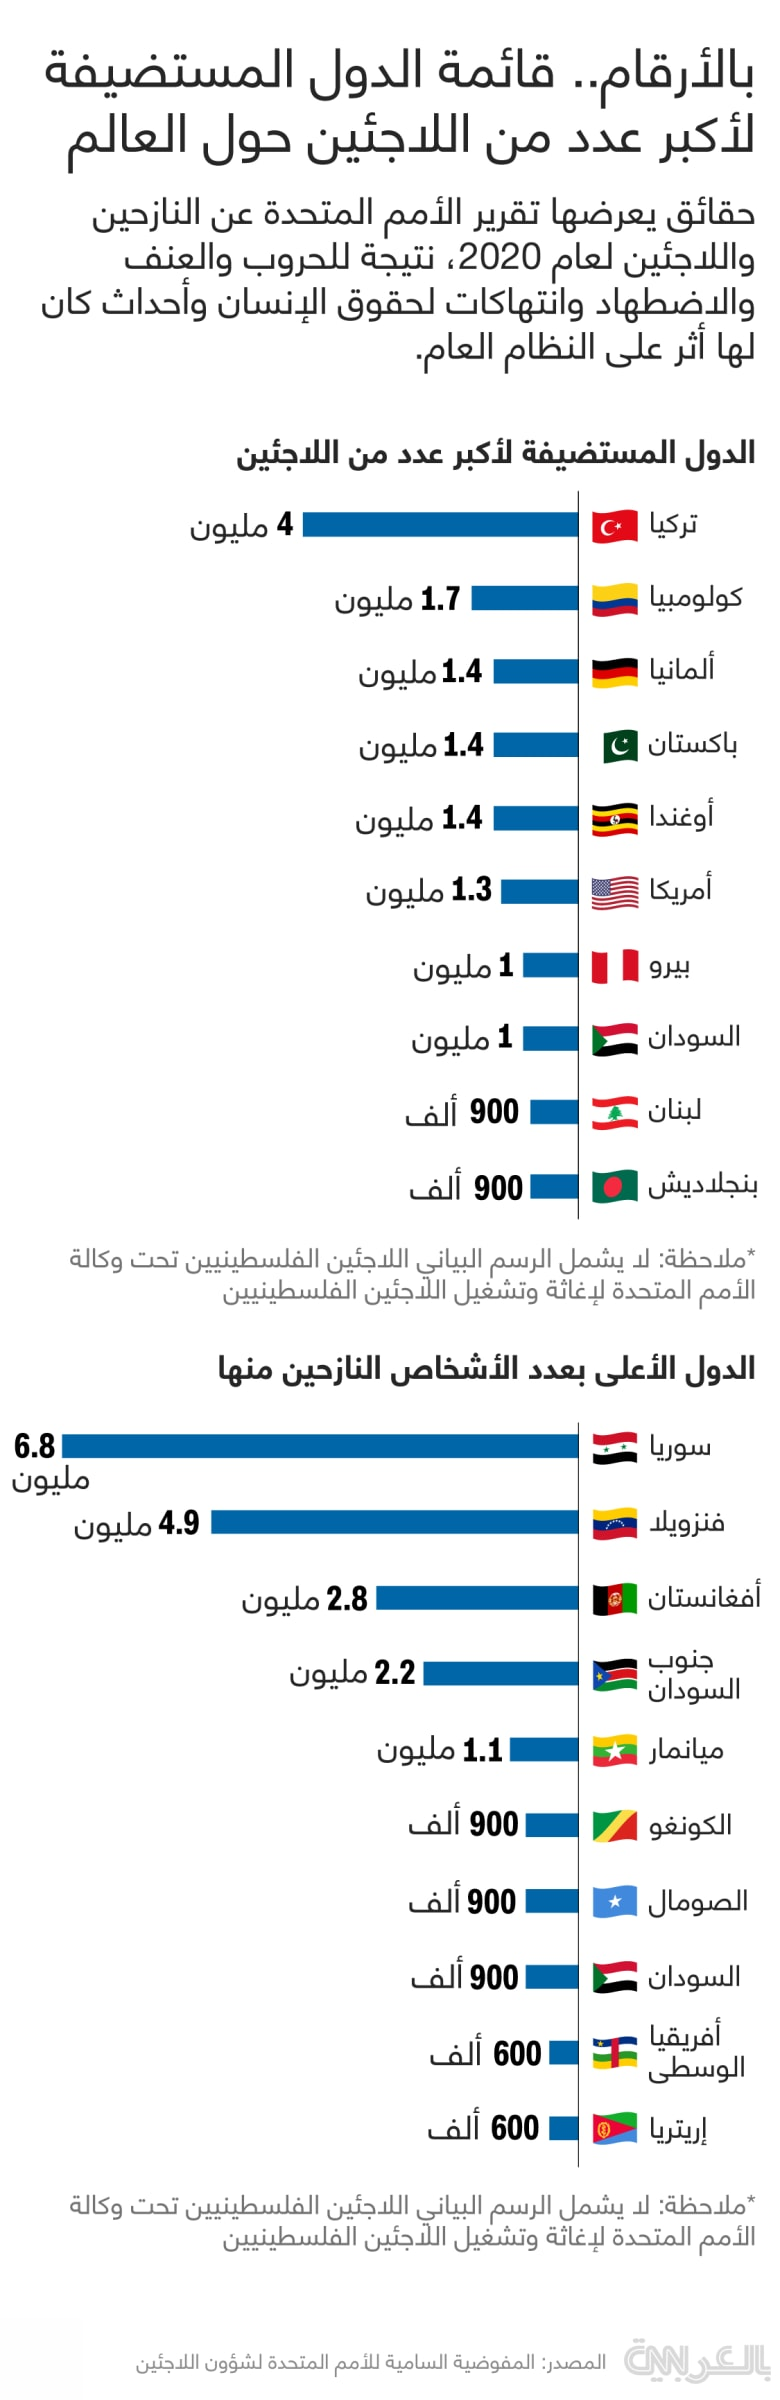 Top-countries-hosting-refugees-2020